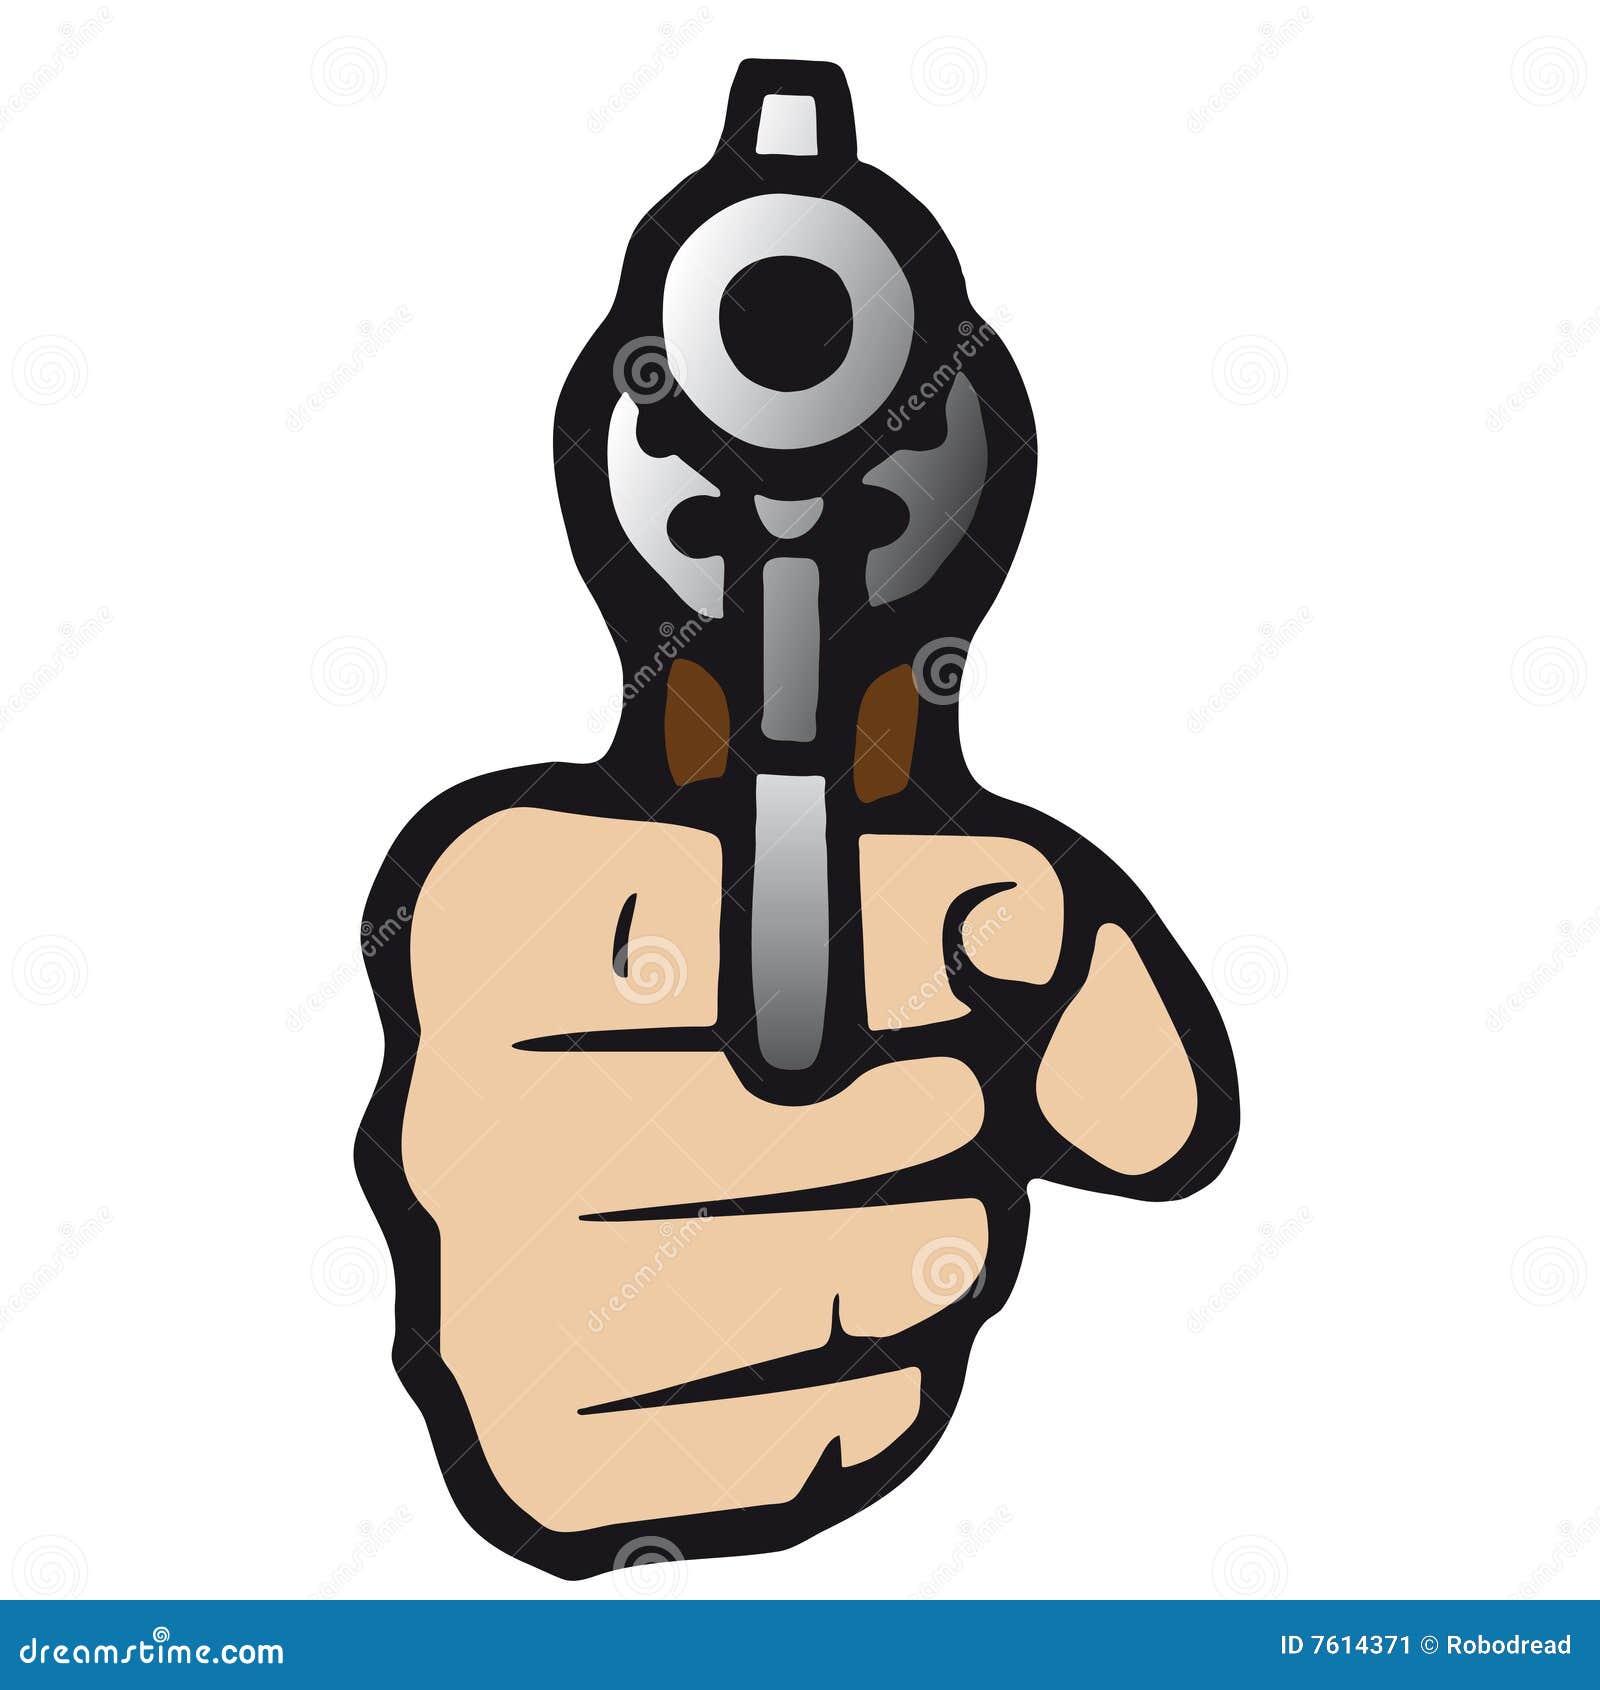 Gun (vector) Stock Image - Image: 7614371